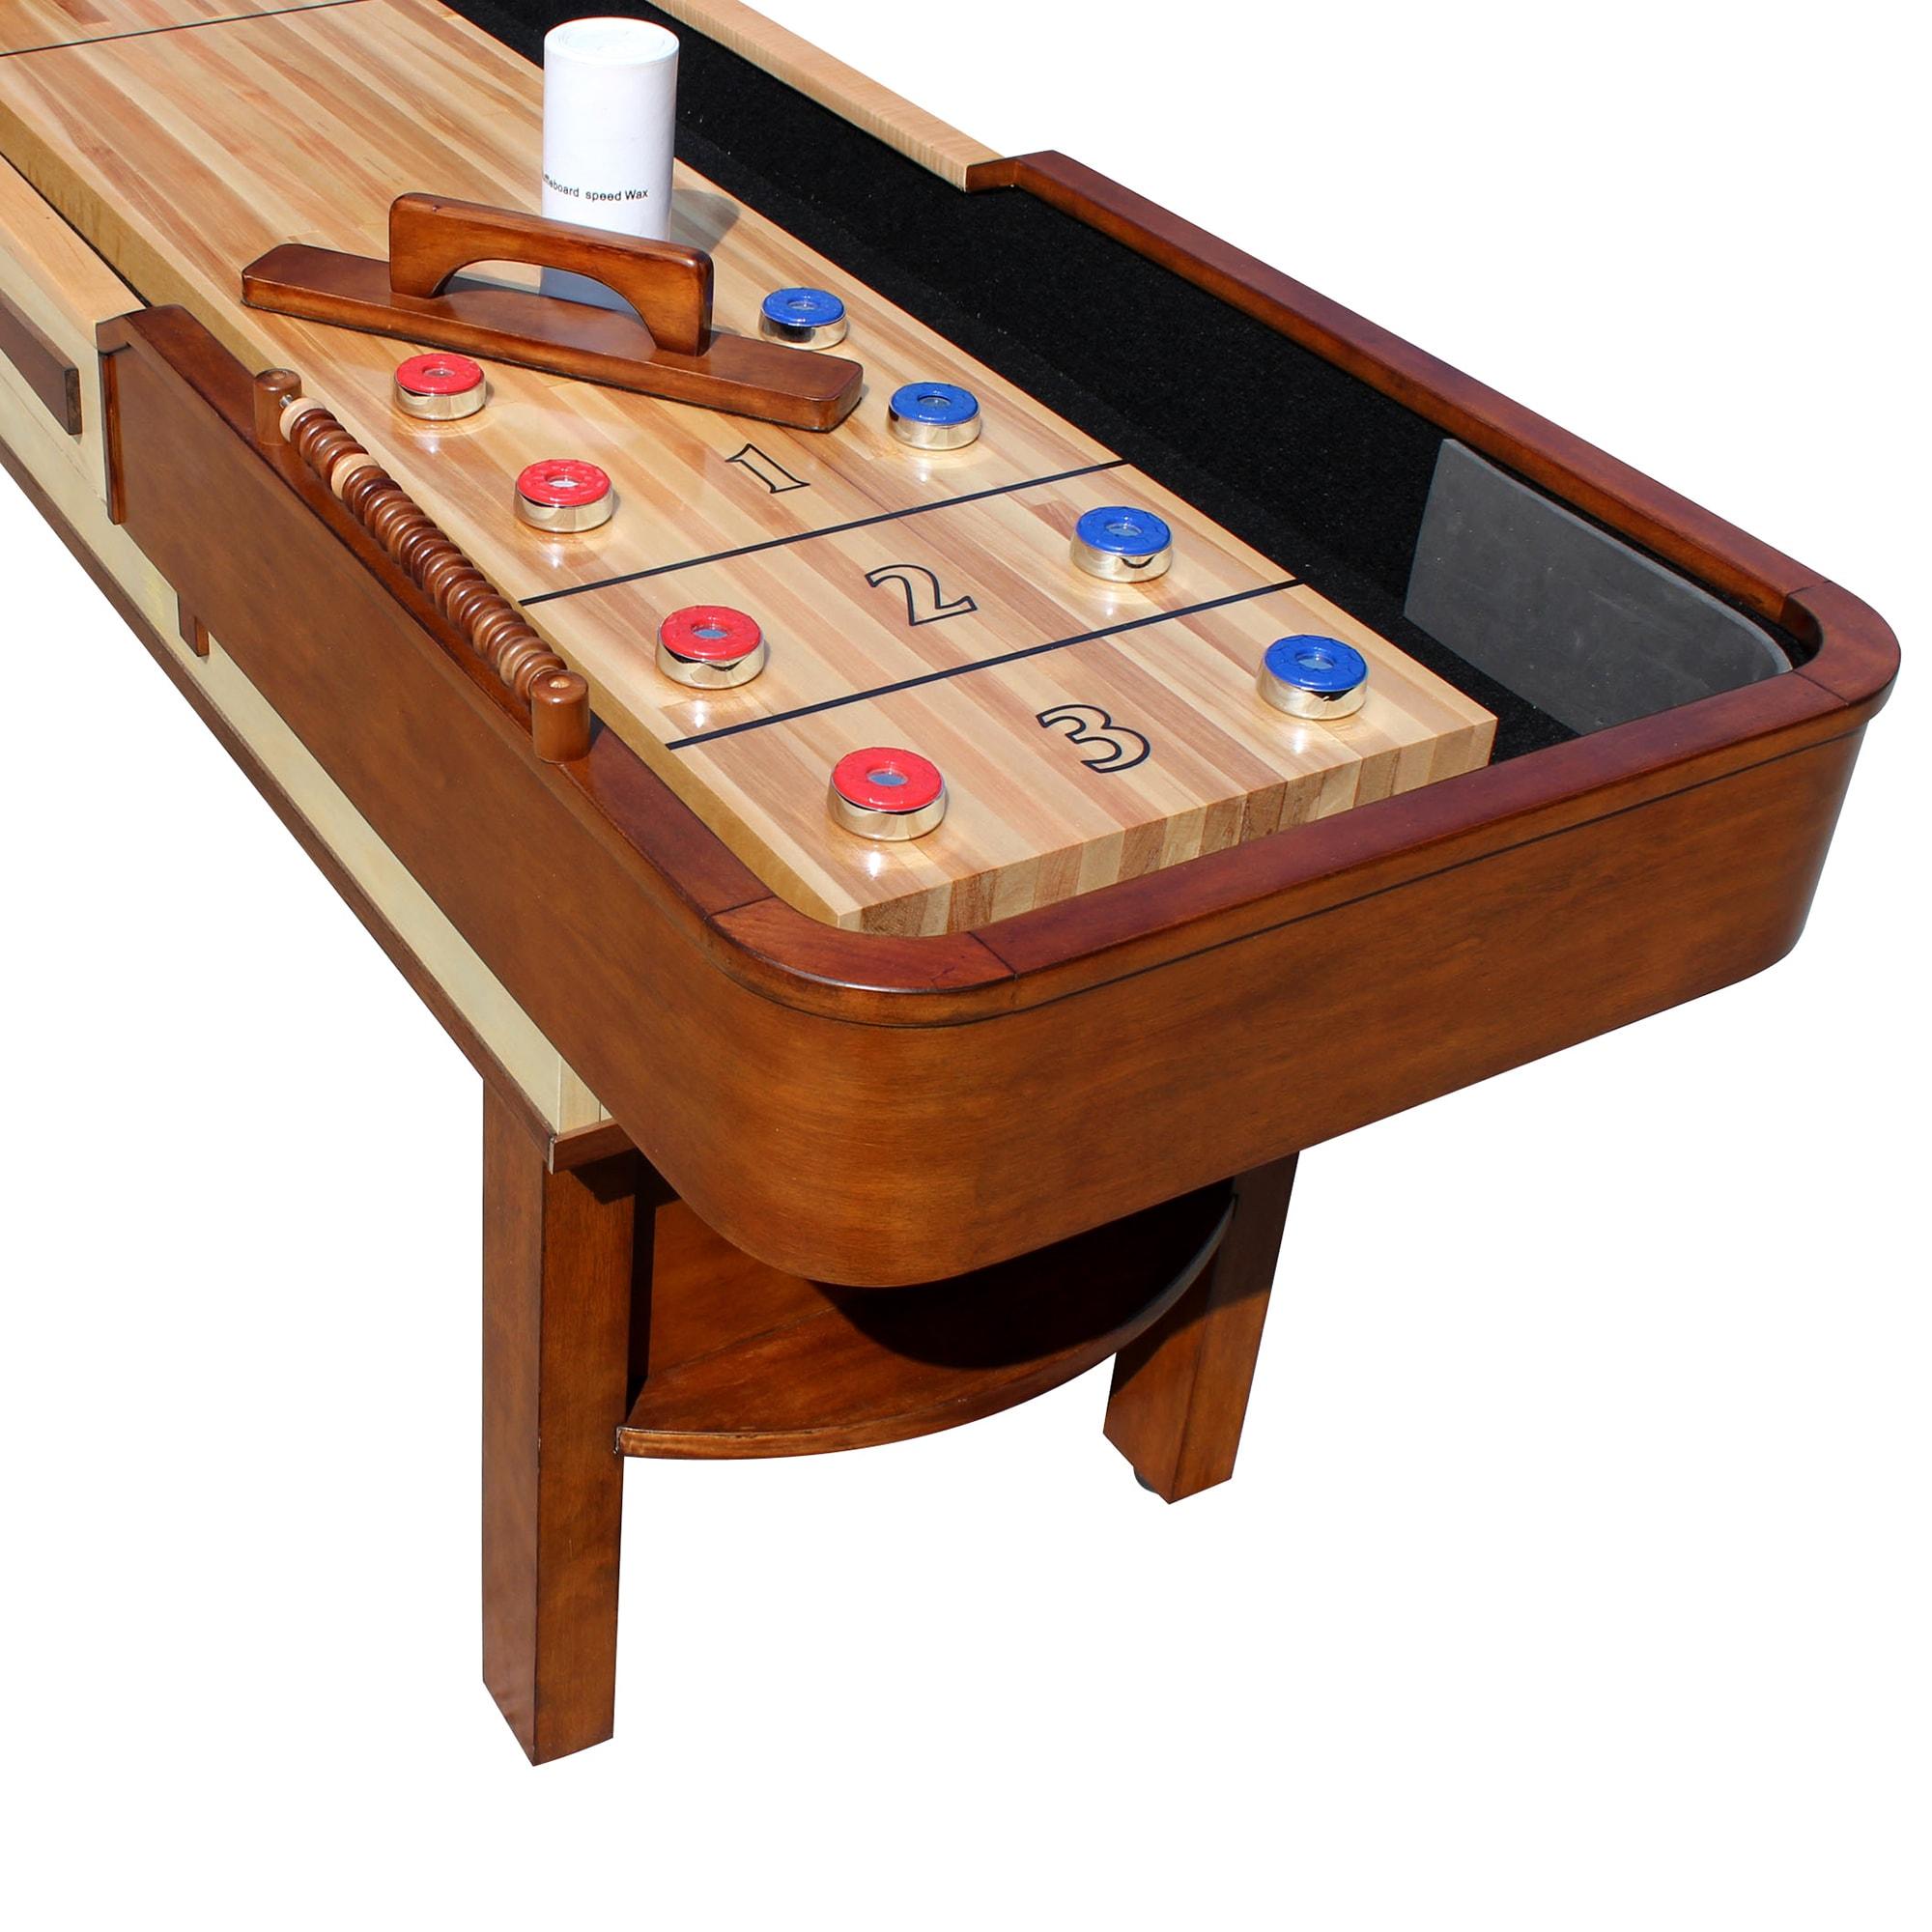 Shop Merlot Ft Shuffleboard Table Free Shipping Today - 12 foot shuffleboard table for sale